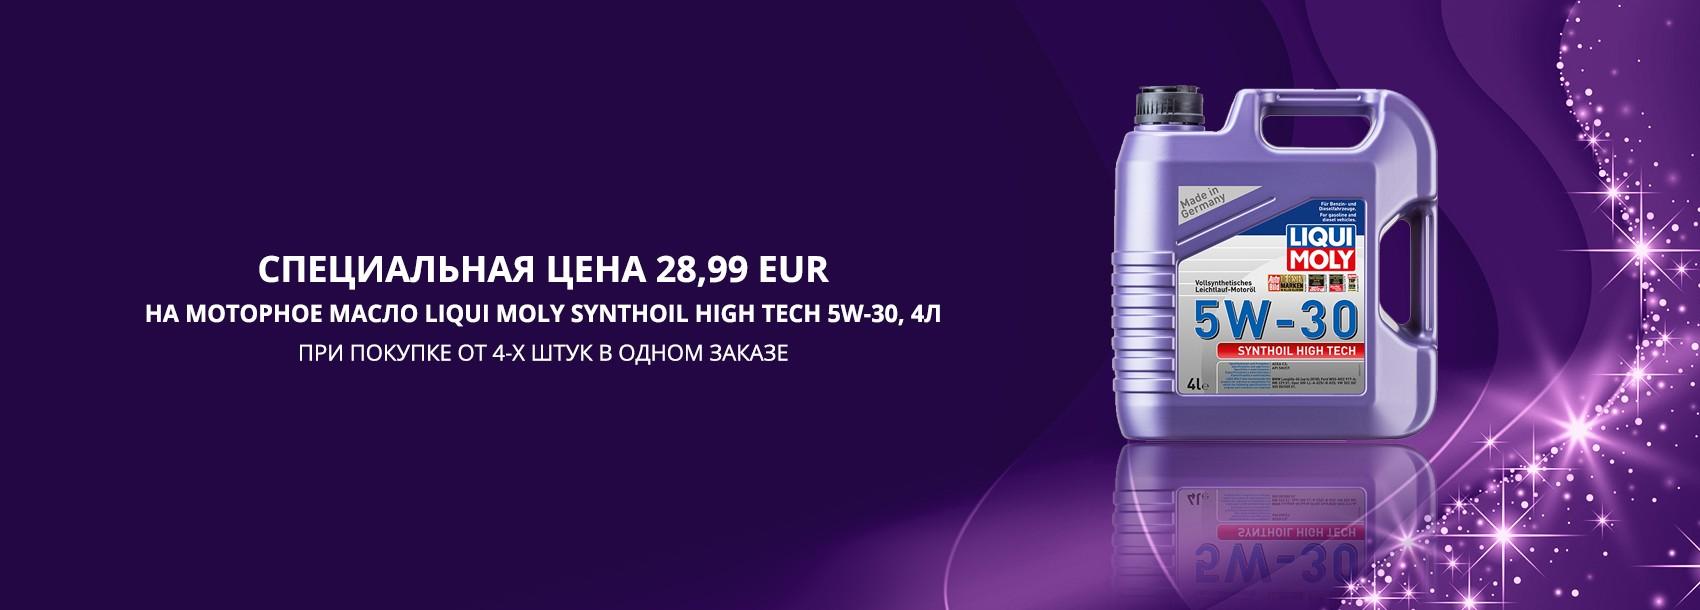 Liqui Moly Synthoil High Tech 5W-30 по специальной цене